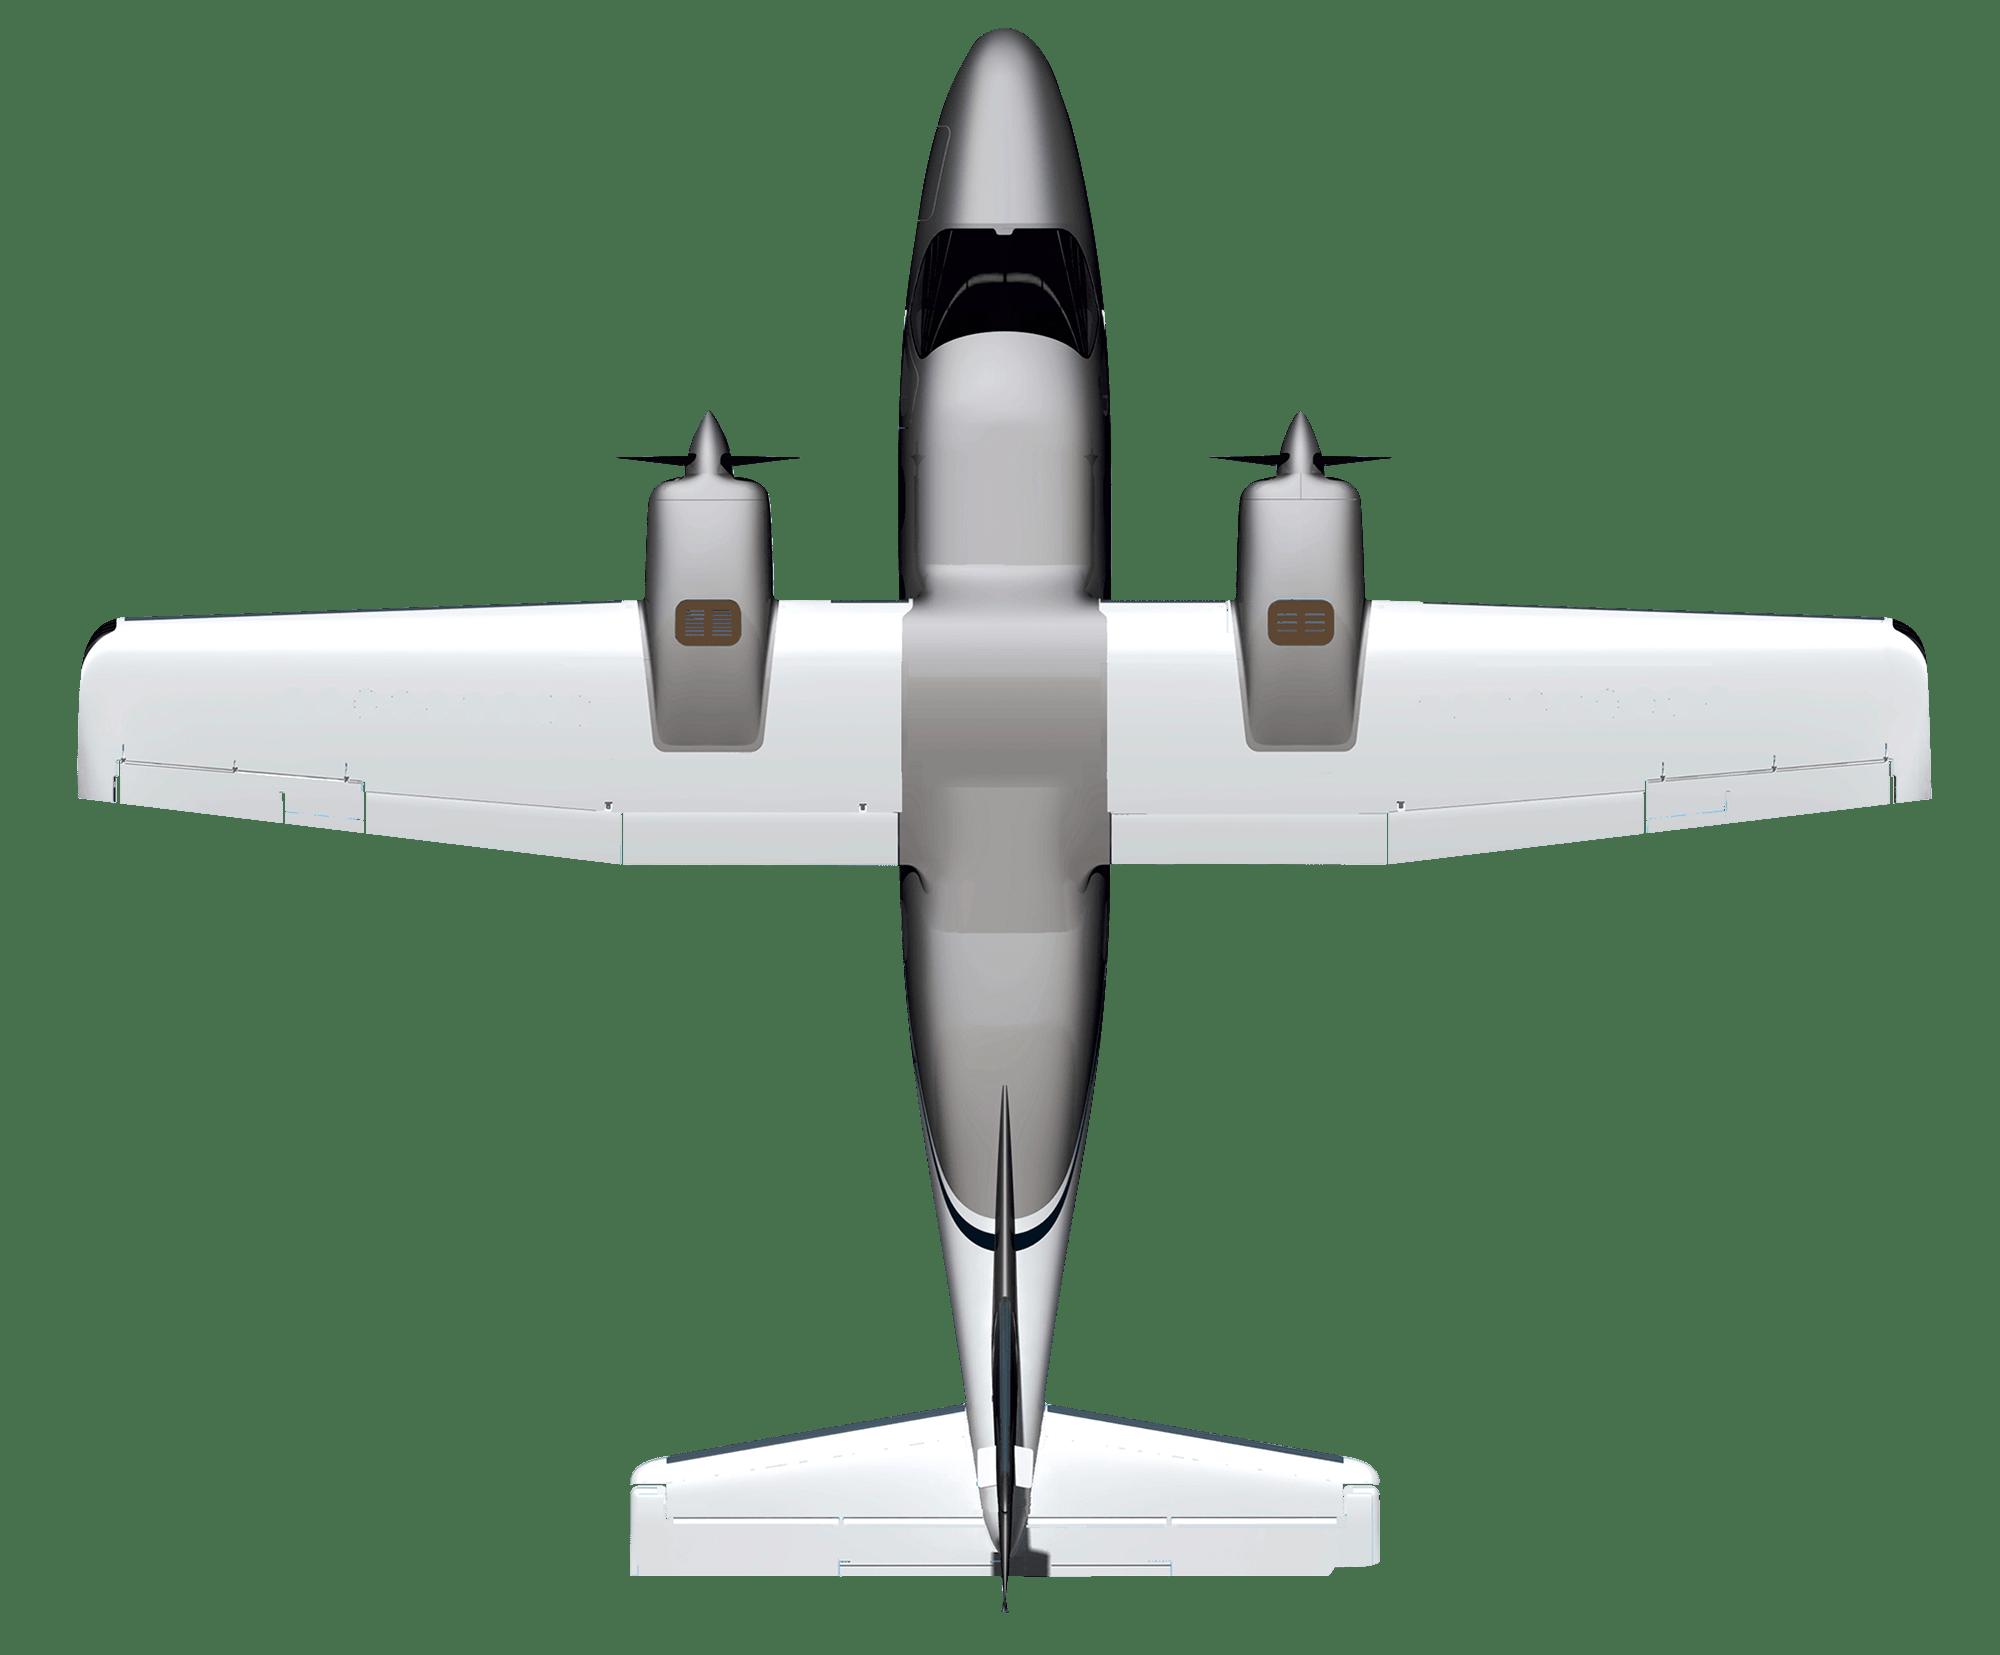 P2012 Airline